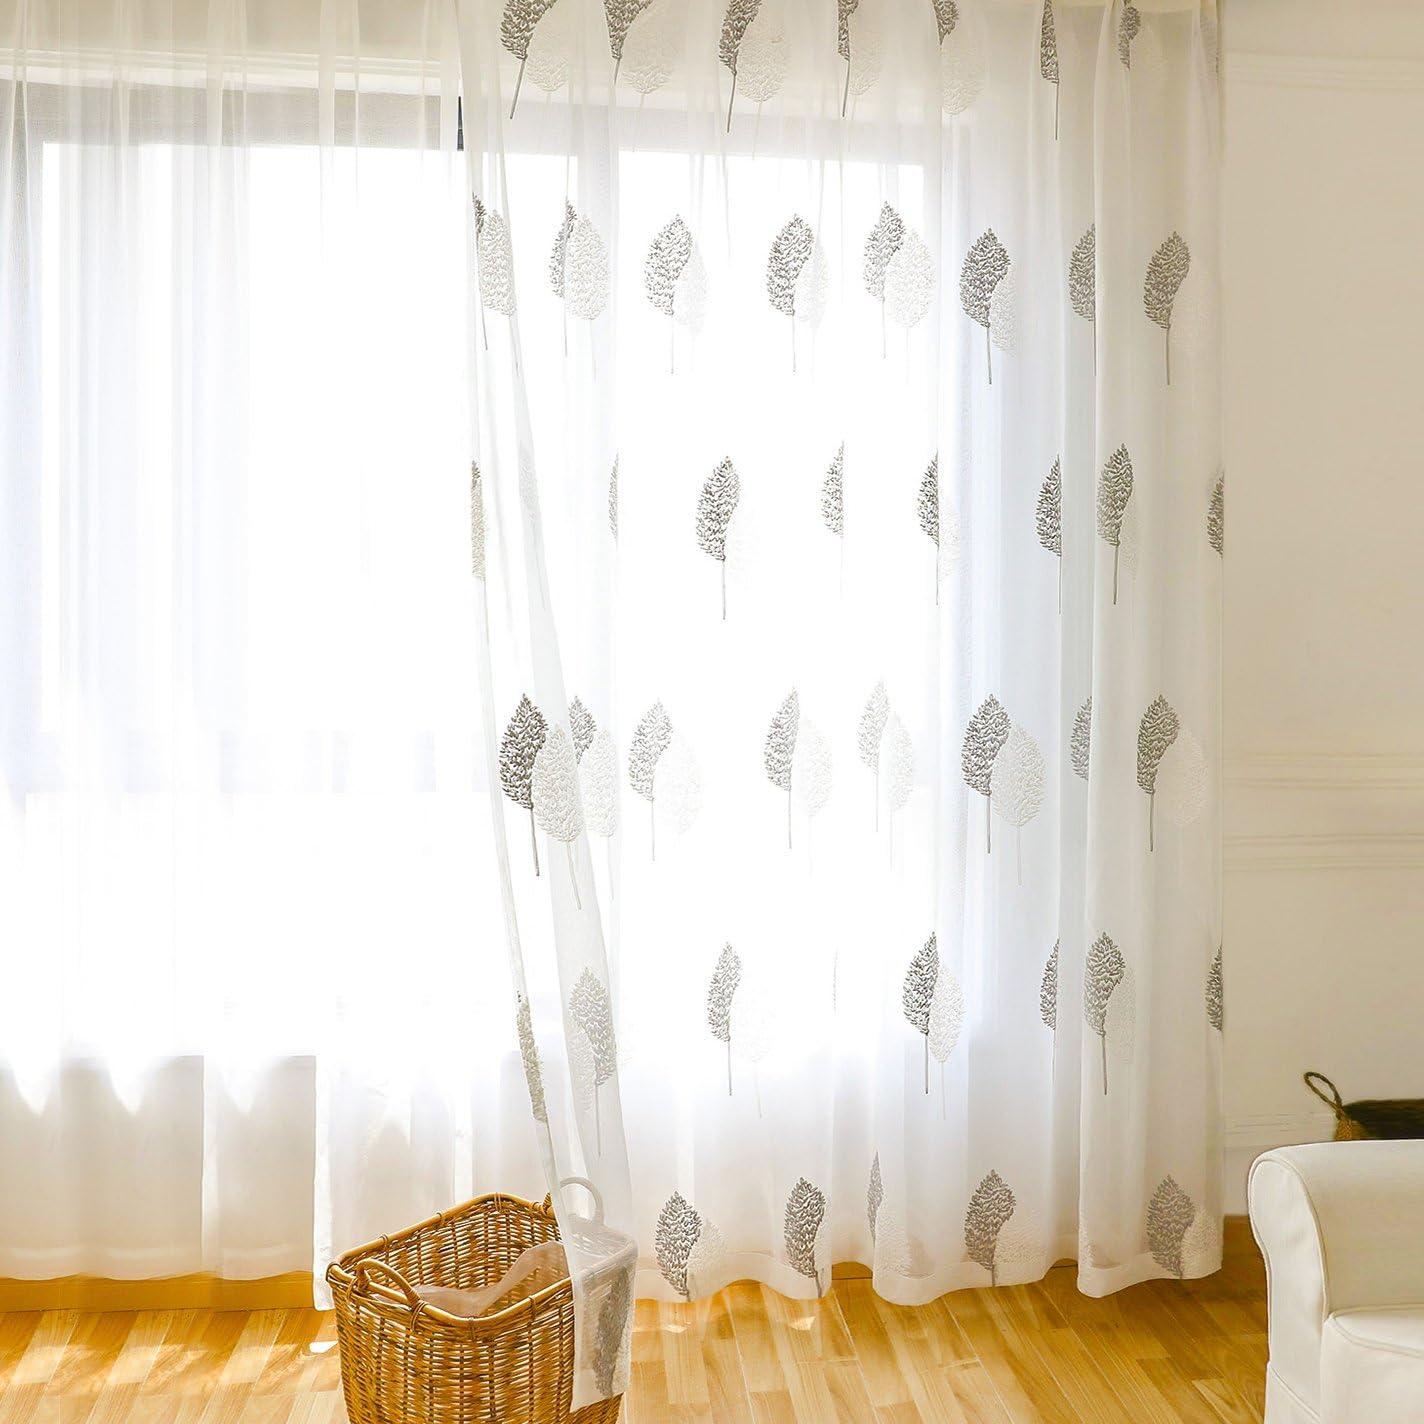 VOGOL White Sheer Curtains Banyan Leaves Embroidered Design Rod Pocket Window Drape